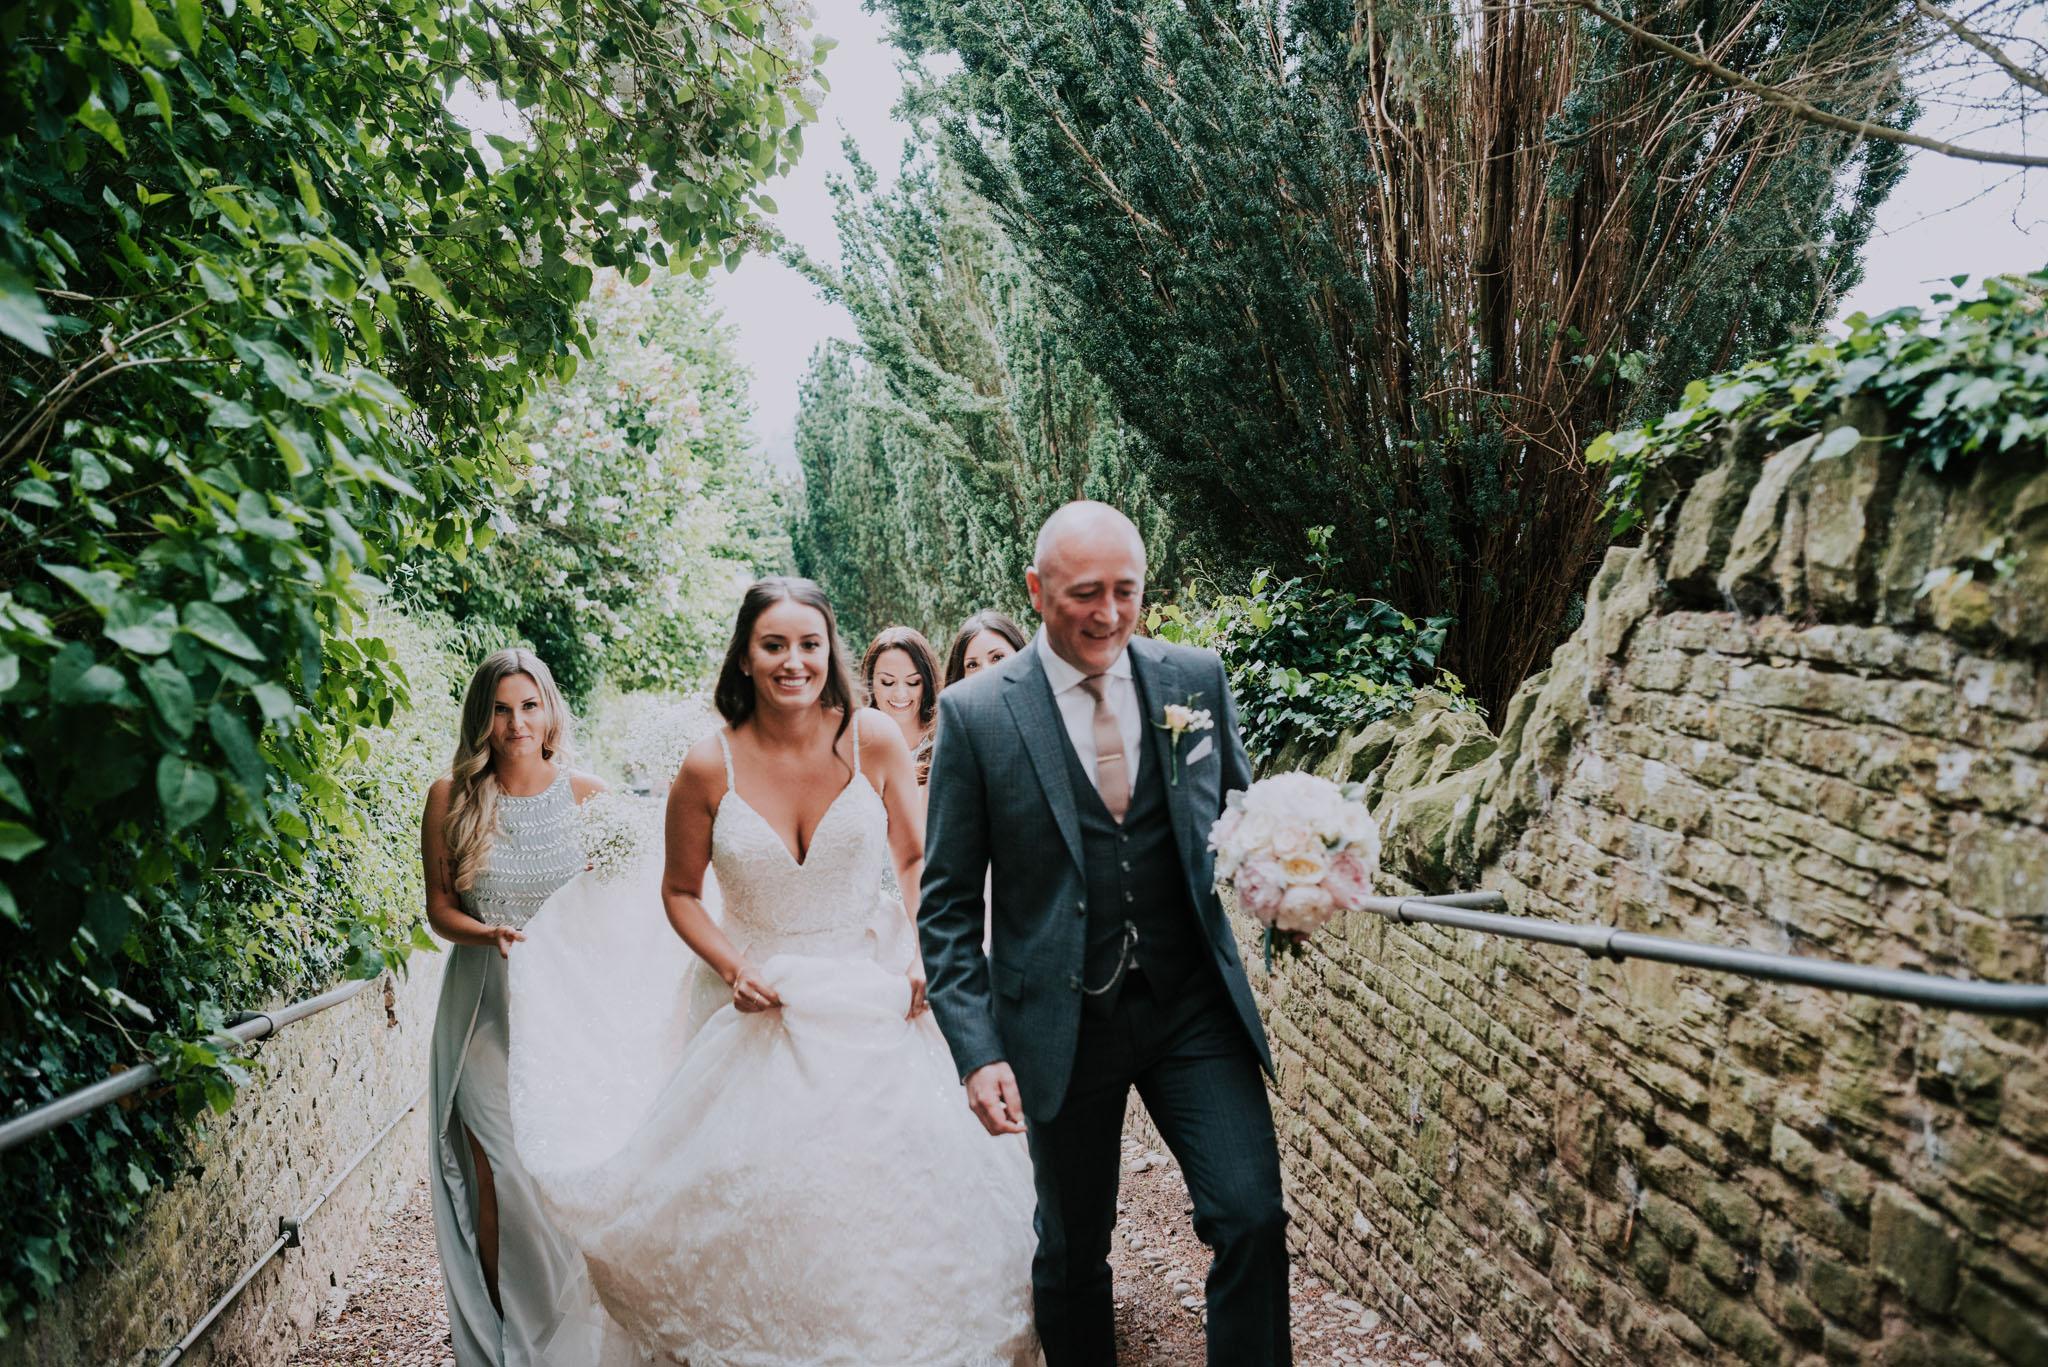 wedding-photographer-glewstone-court-hereford-scott-stockwell-photography147.jpg